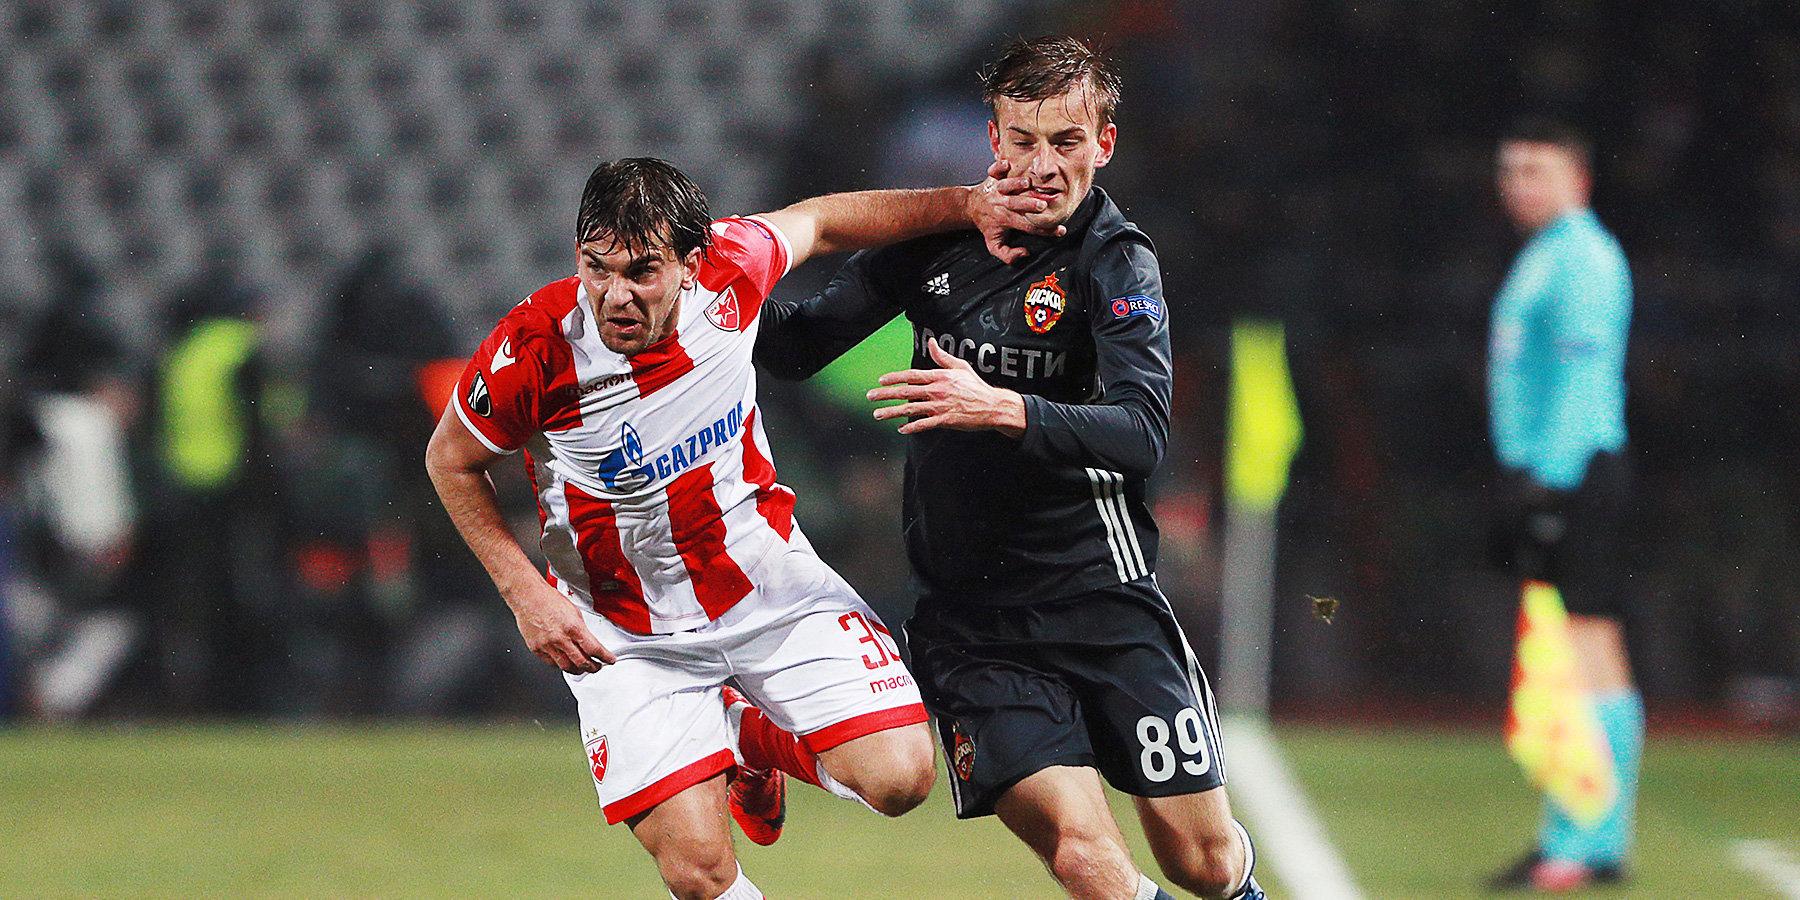 «Црвена Звезда» разгромила «Явор» перед вторым матчем сЦСКА